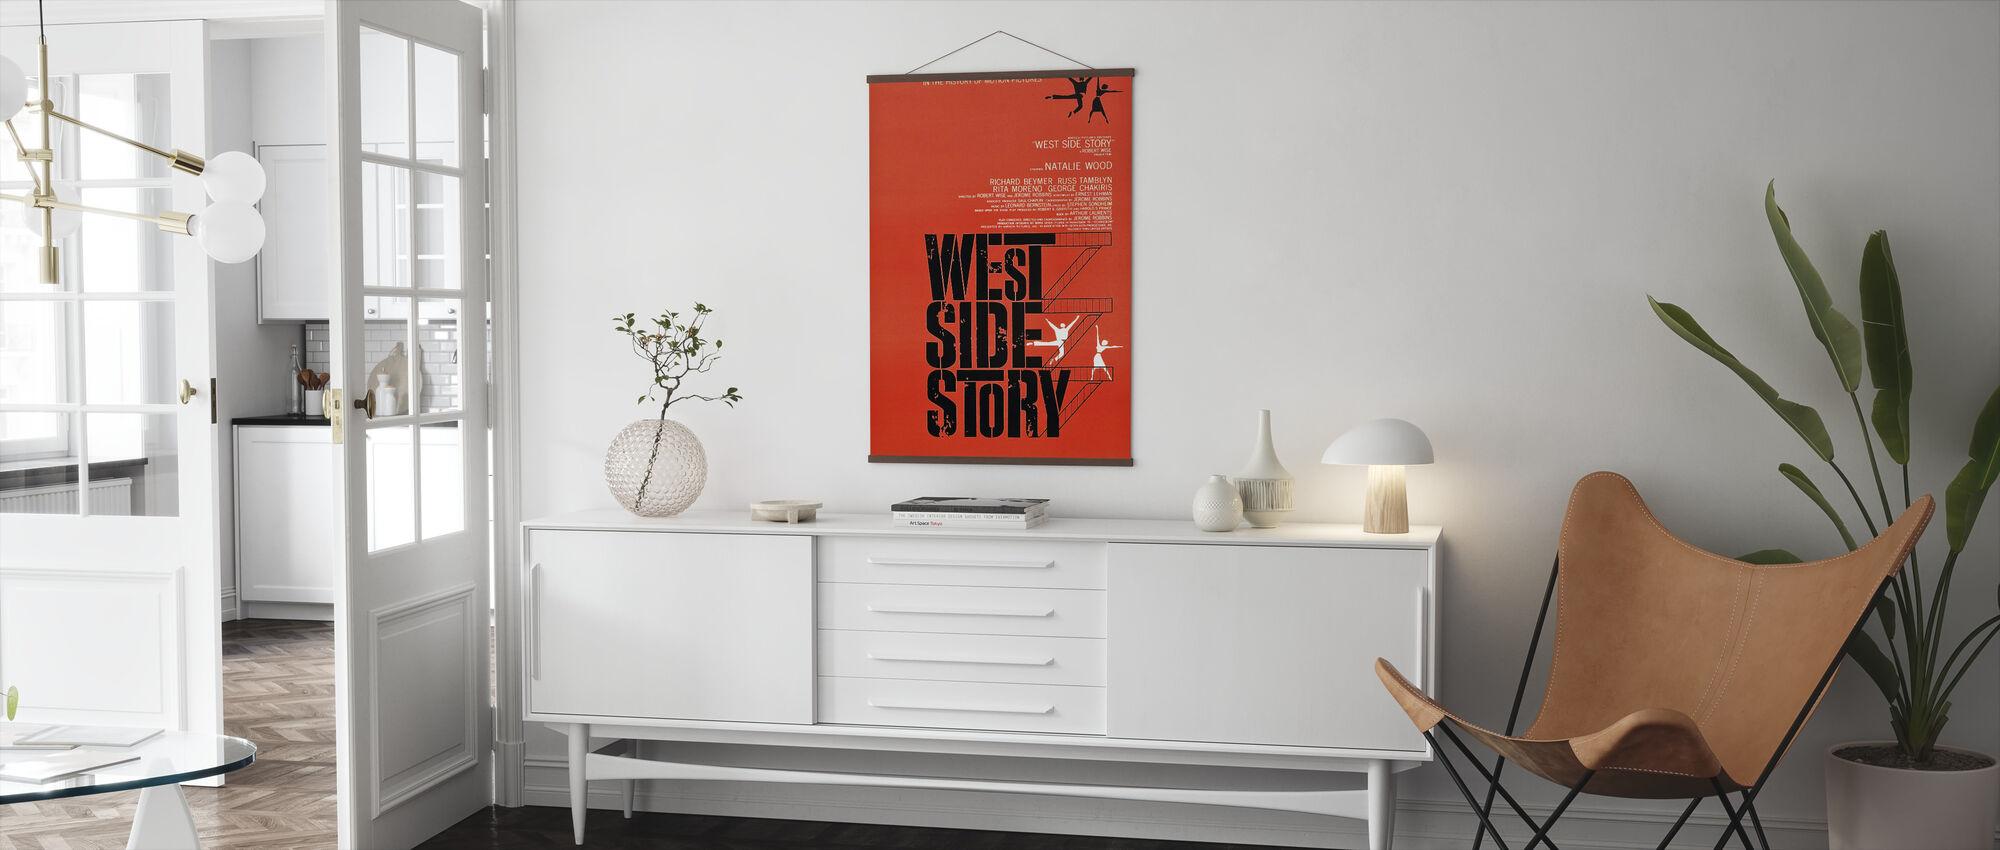 West Side Story - Poster - Living Room